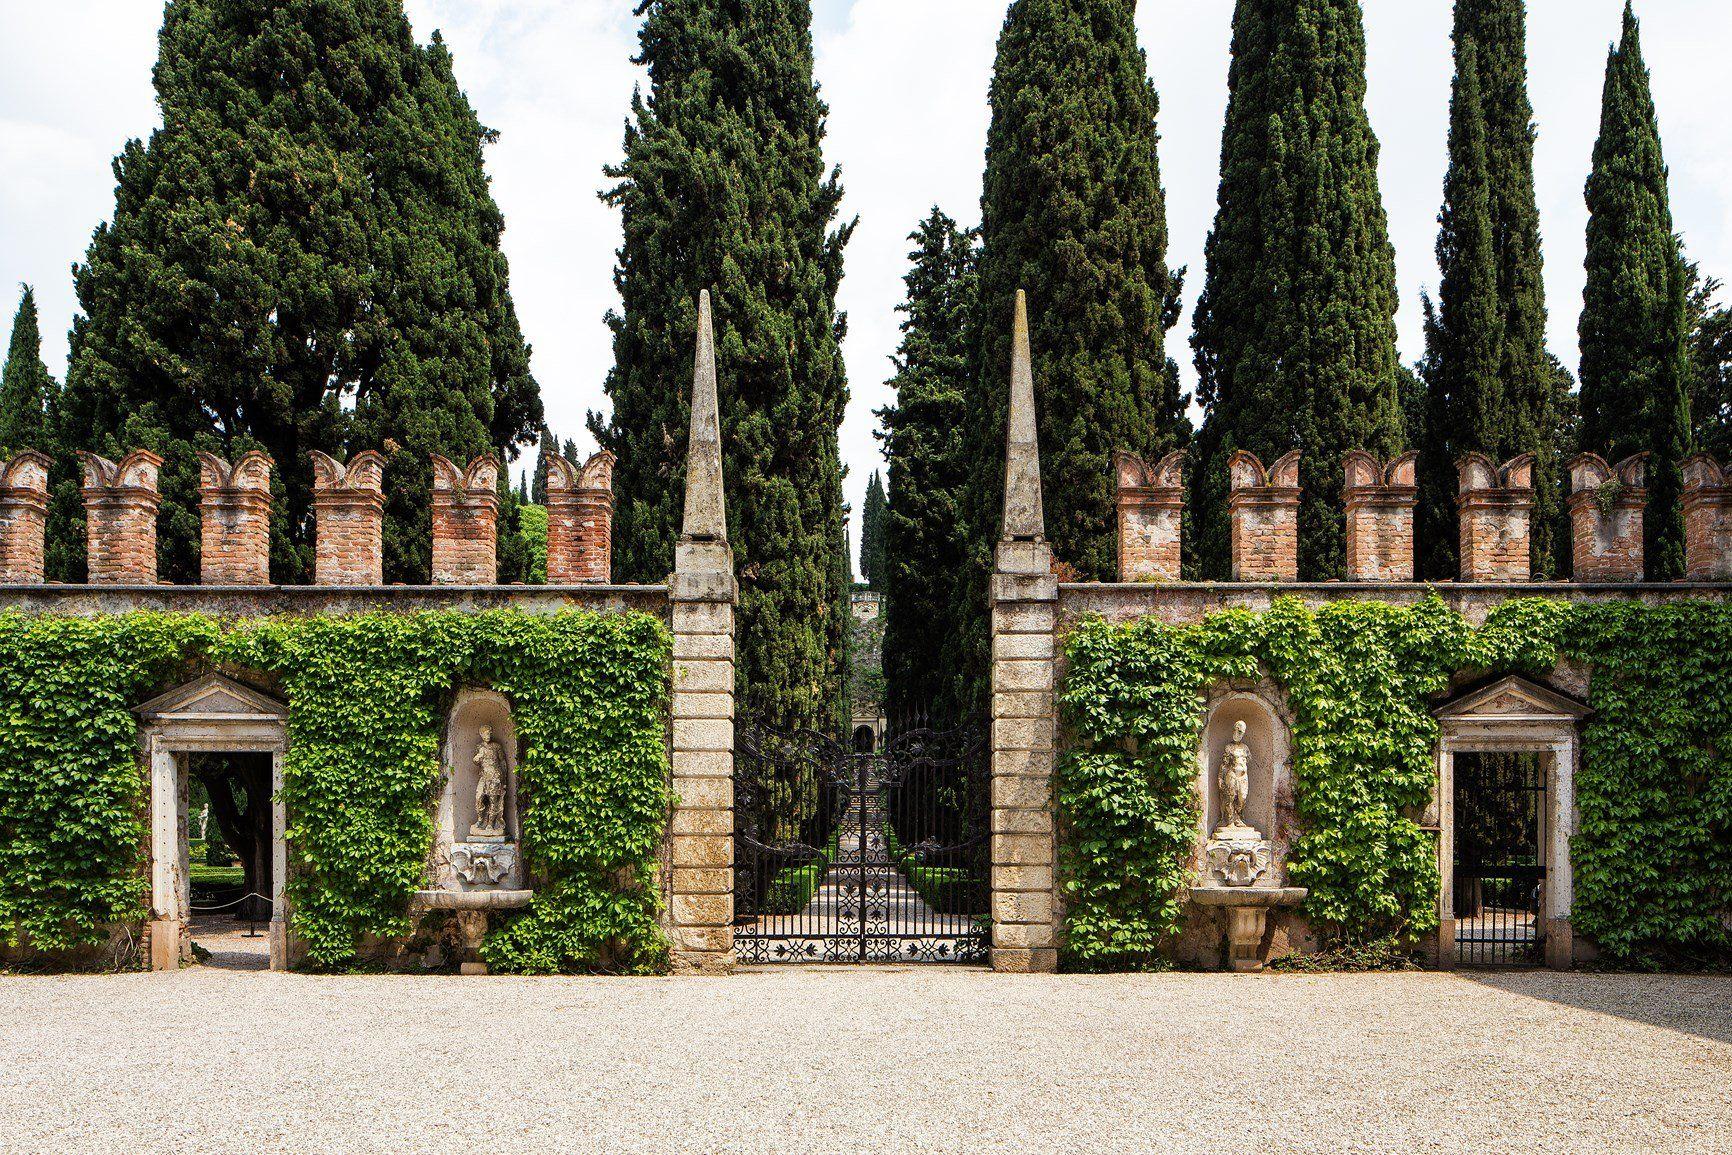 Giardino Giusti apre le porte all'arte contemporanea